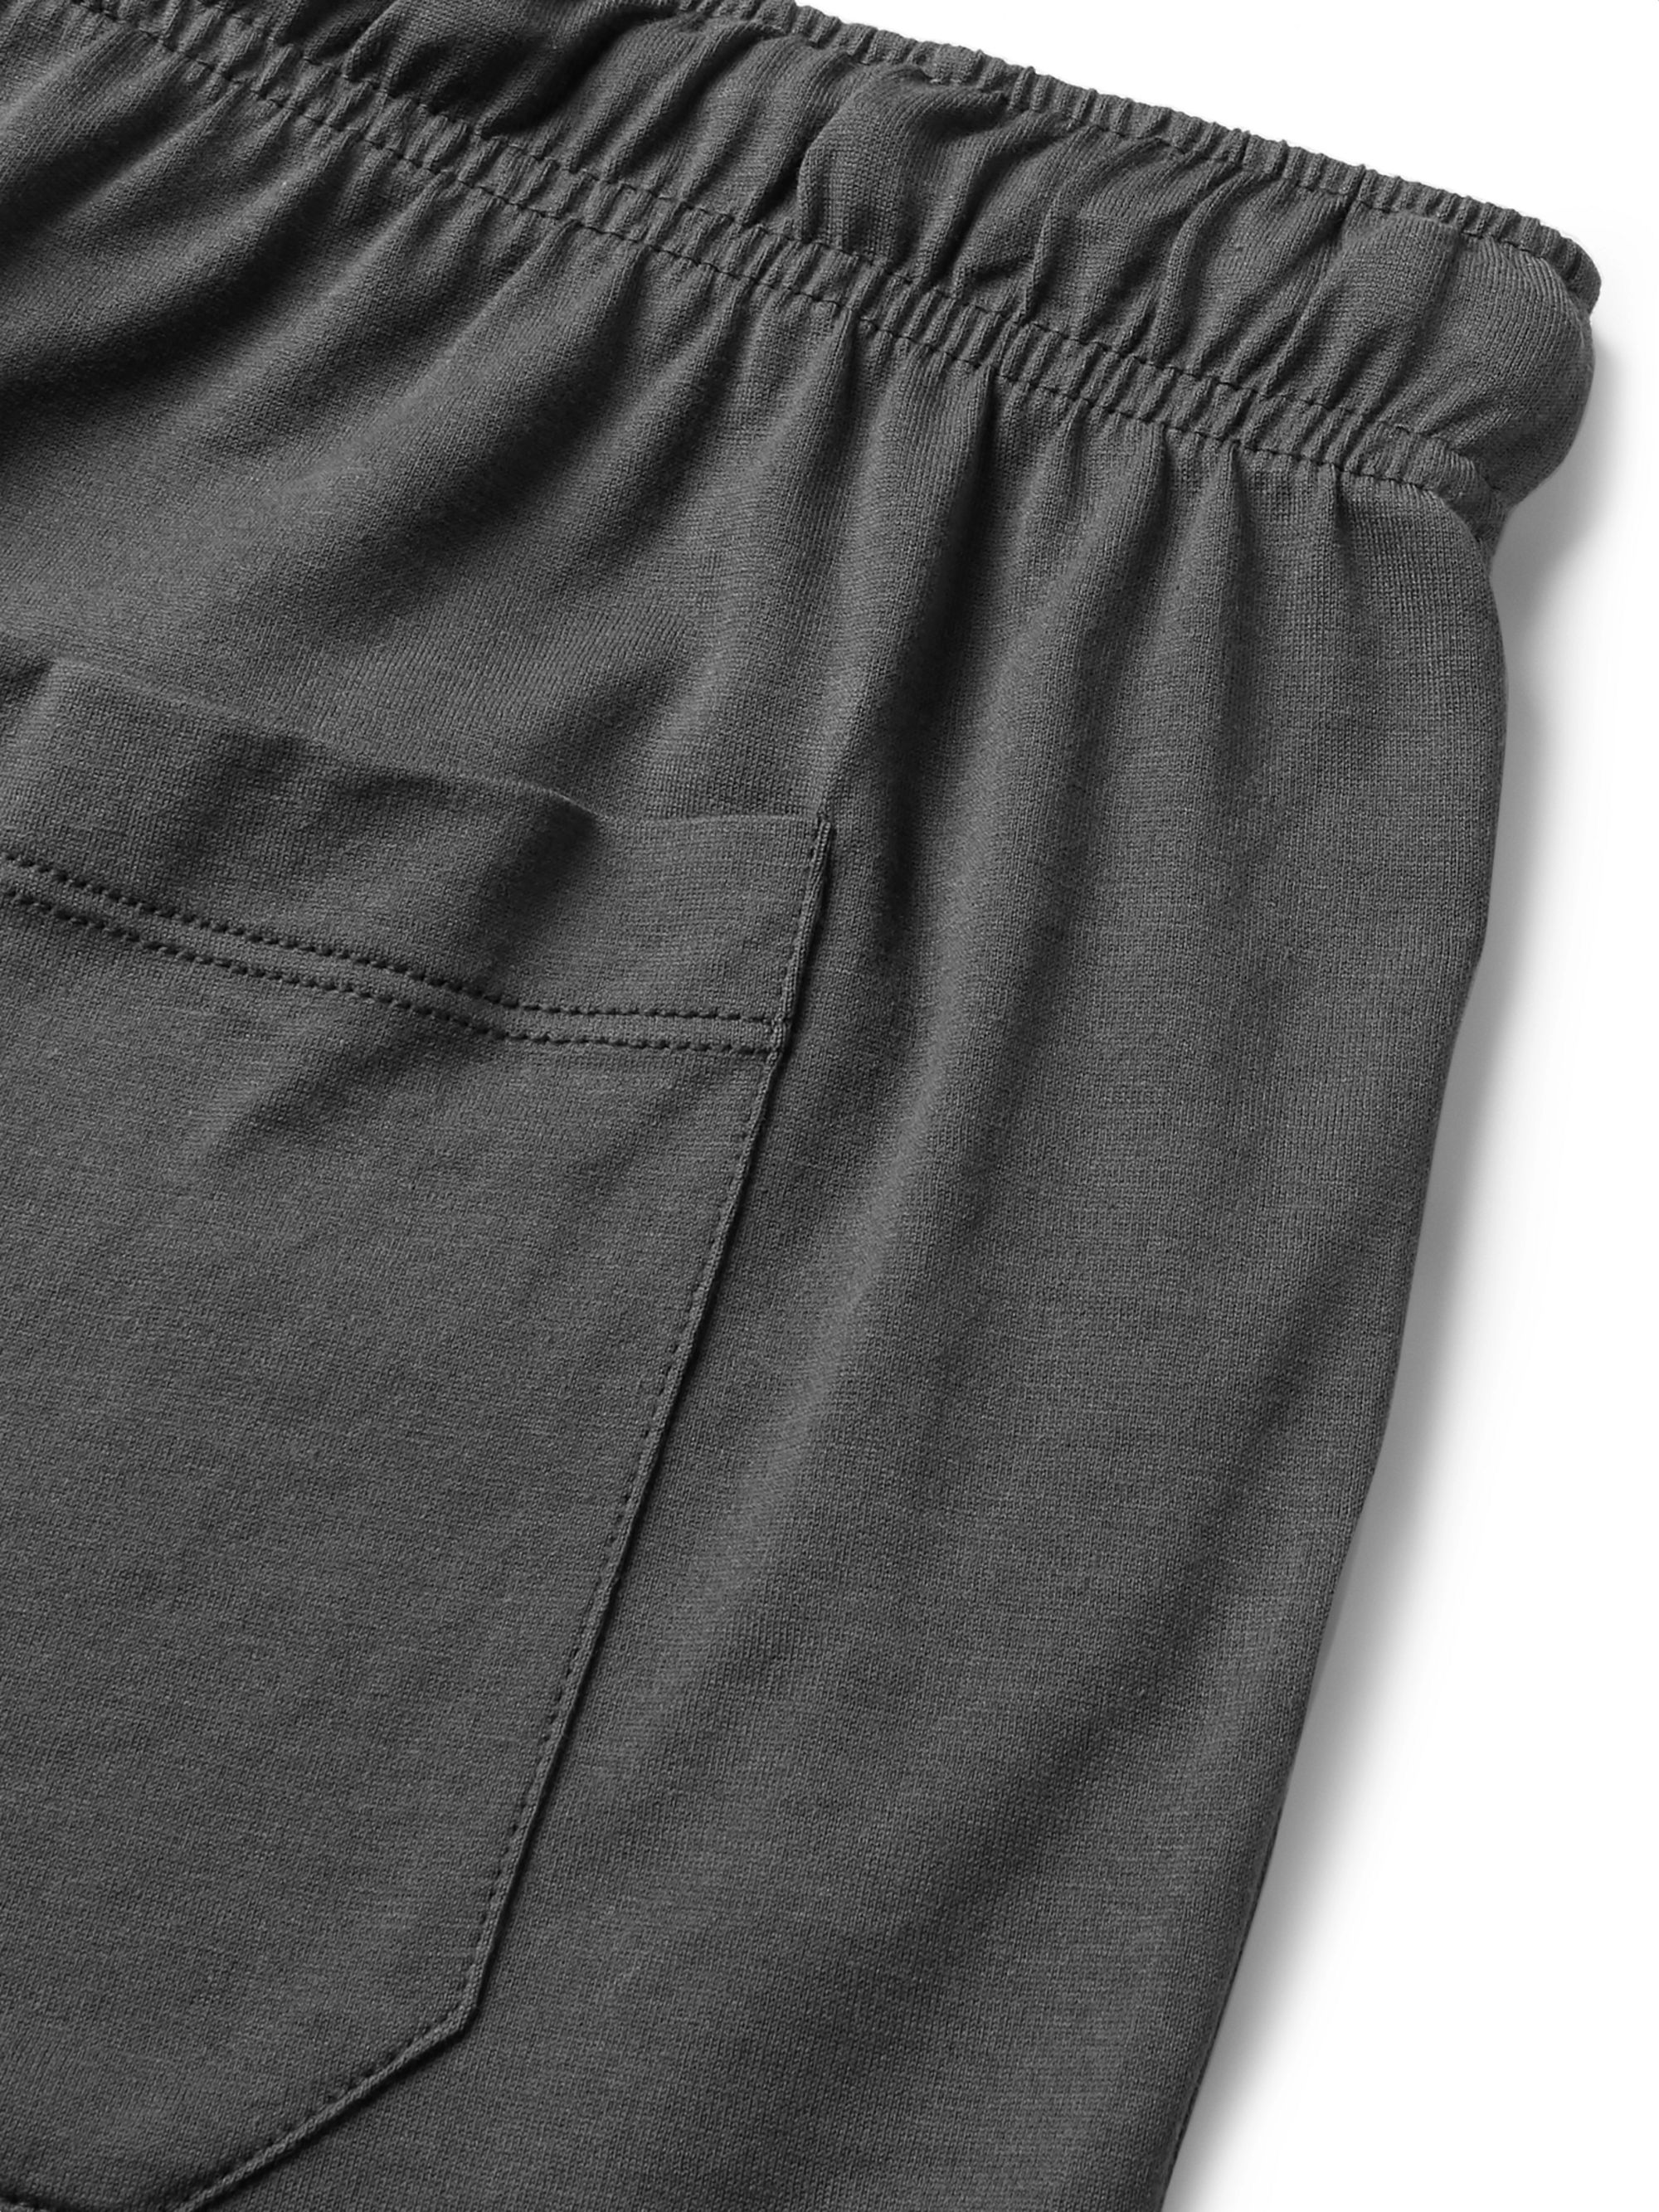 Josef Cotton Jersey Pyjama Shorts